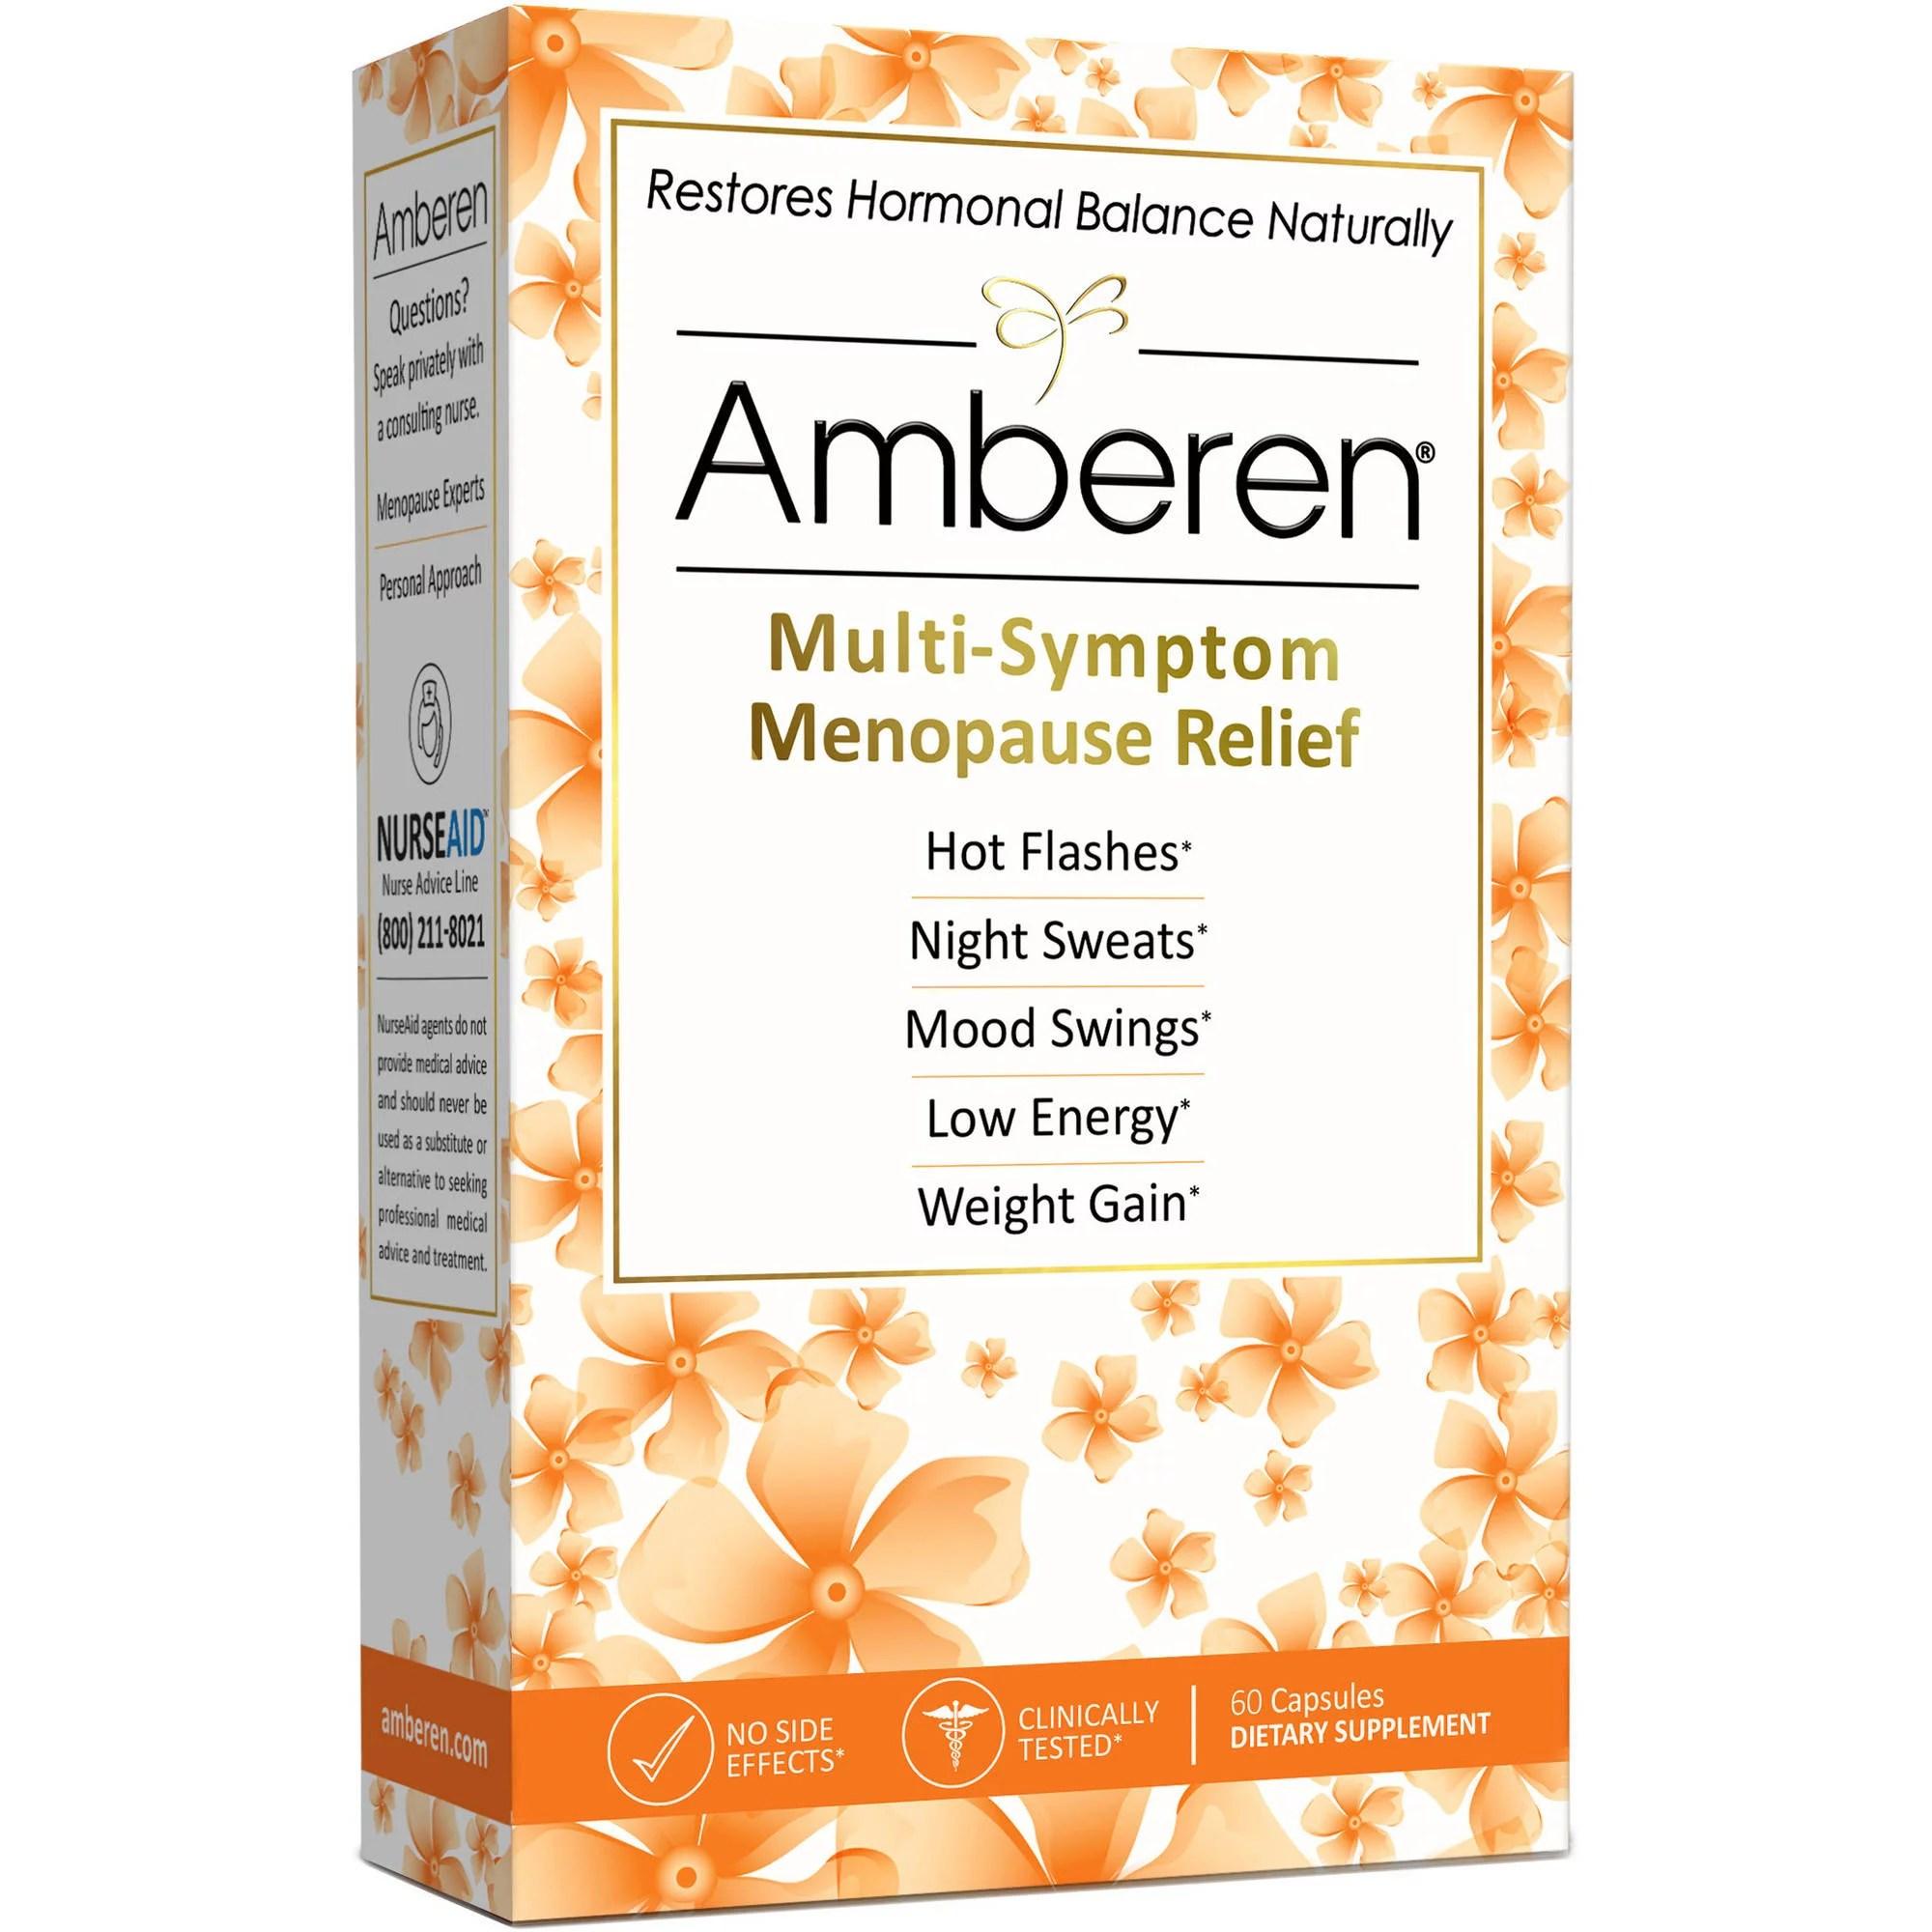 Amberen Multi-Symptom Menopause Relief Dietary Supplement ...